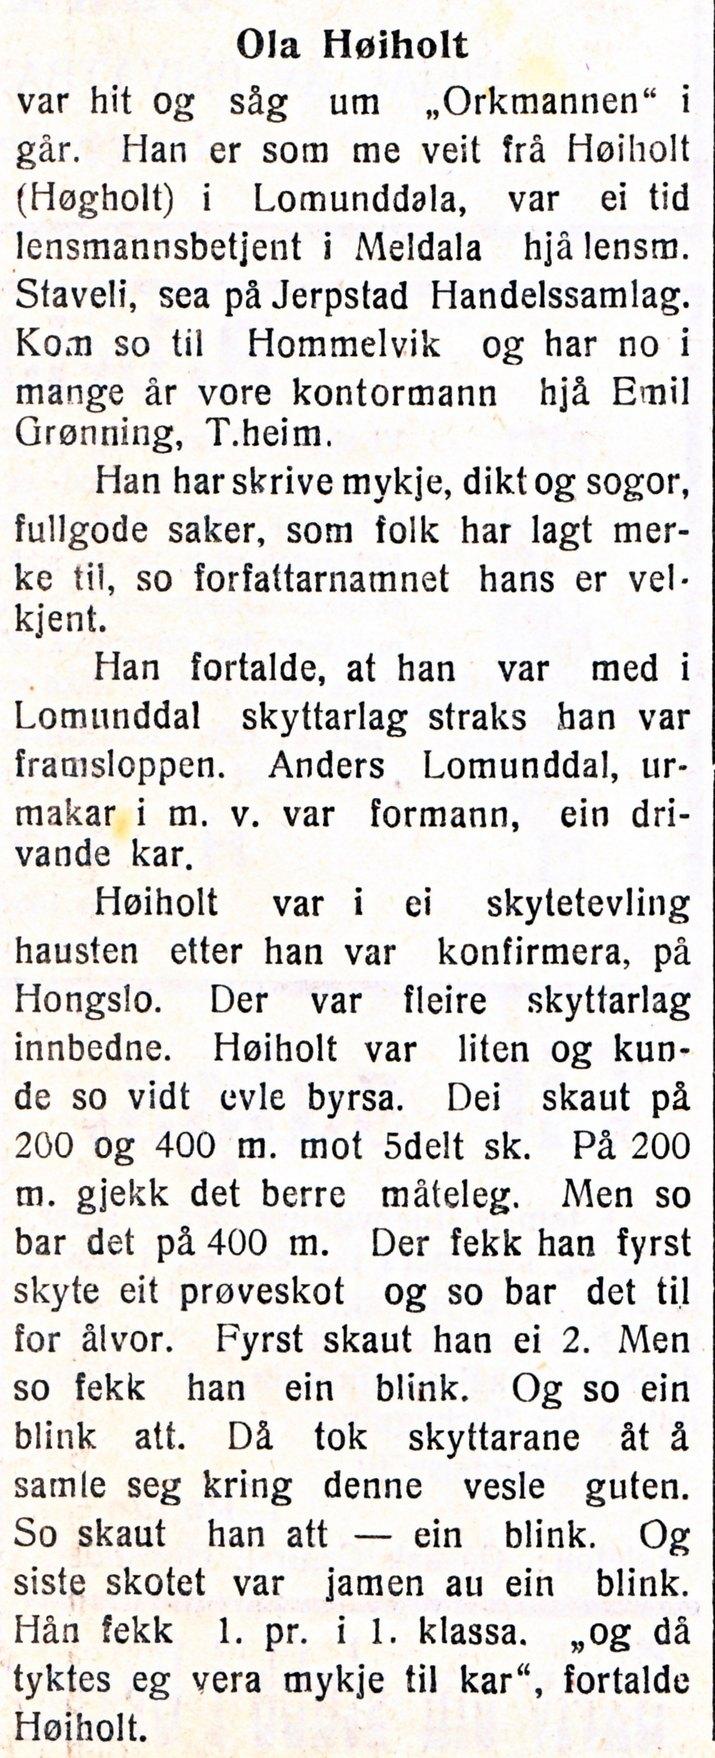 Ola Høyholt_715x1758.jpg